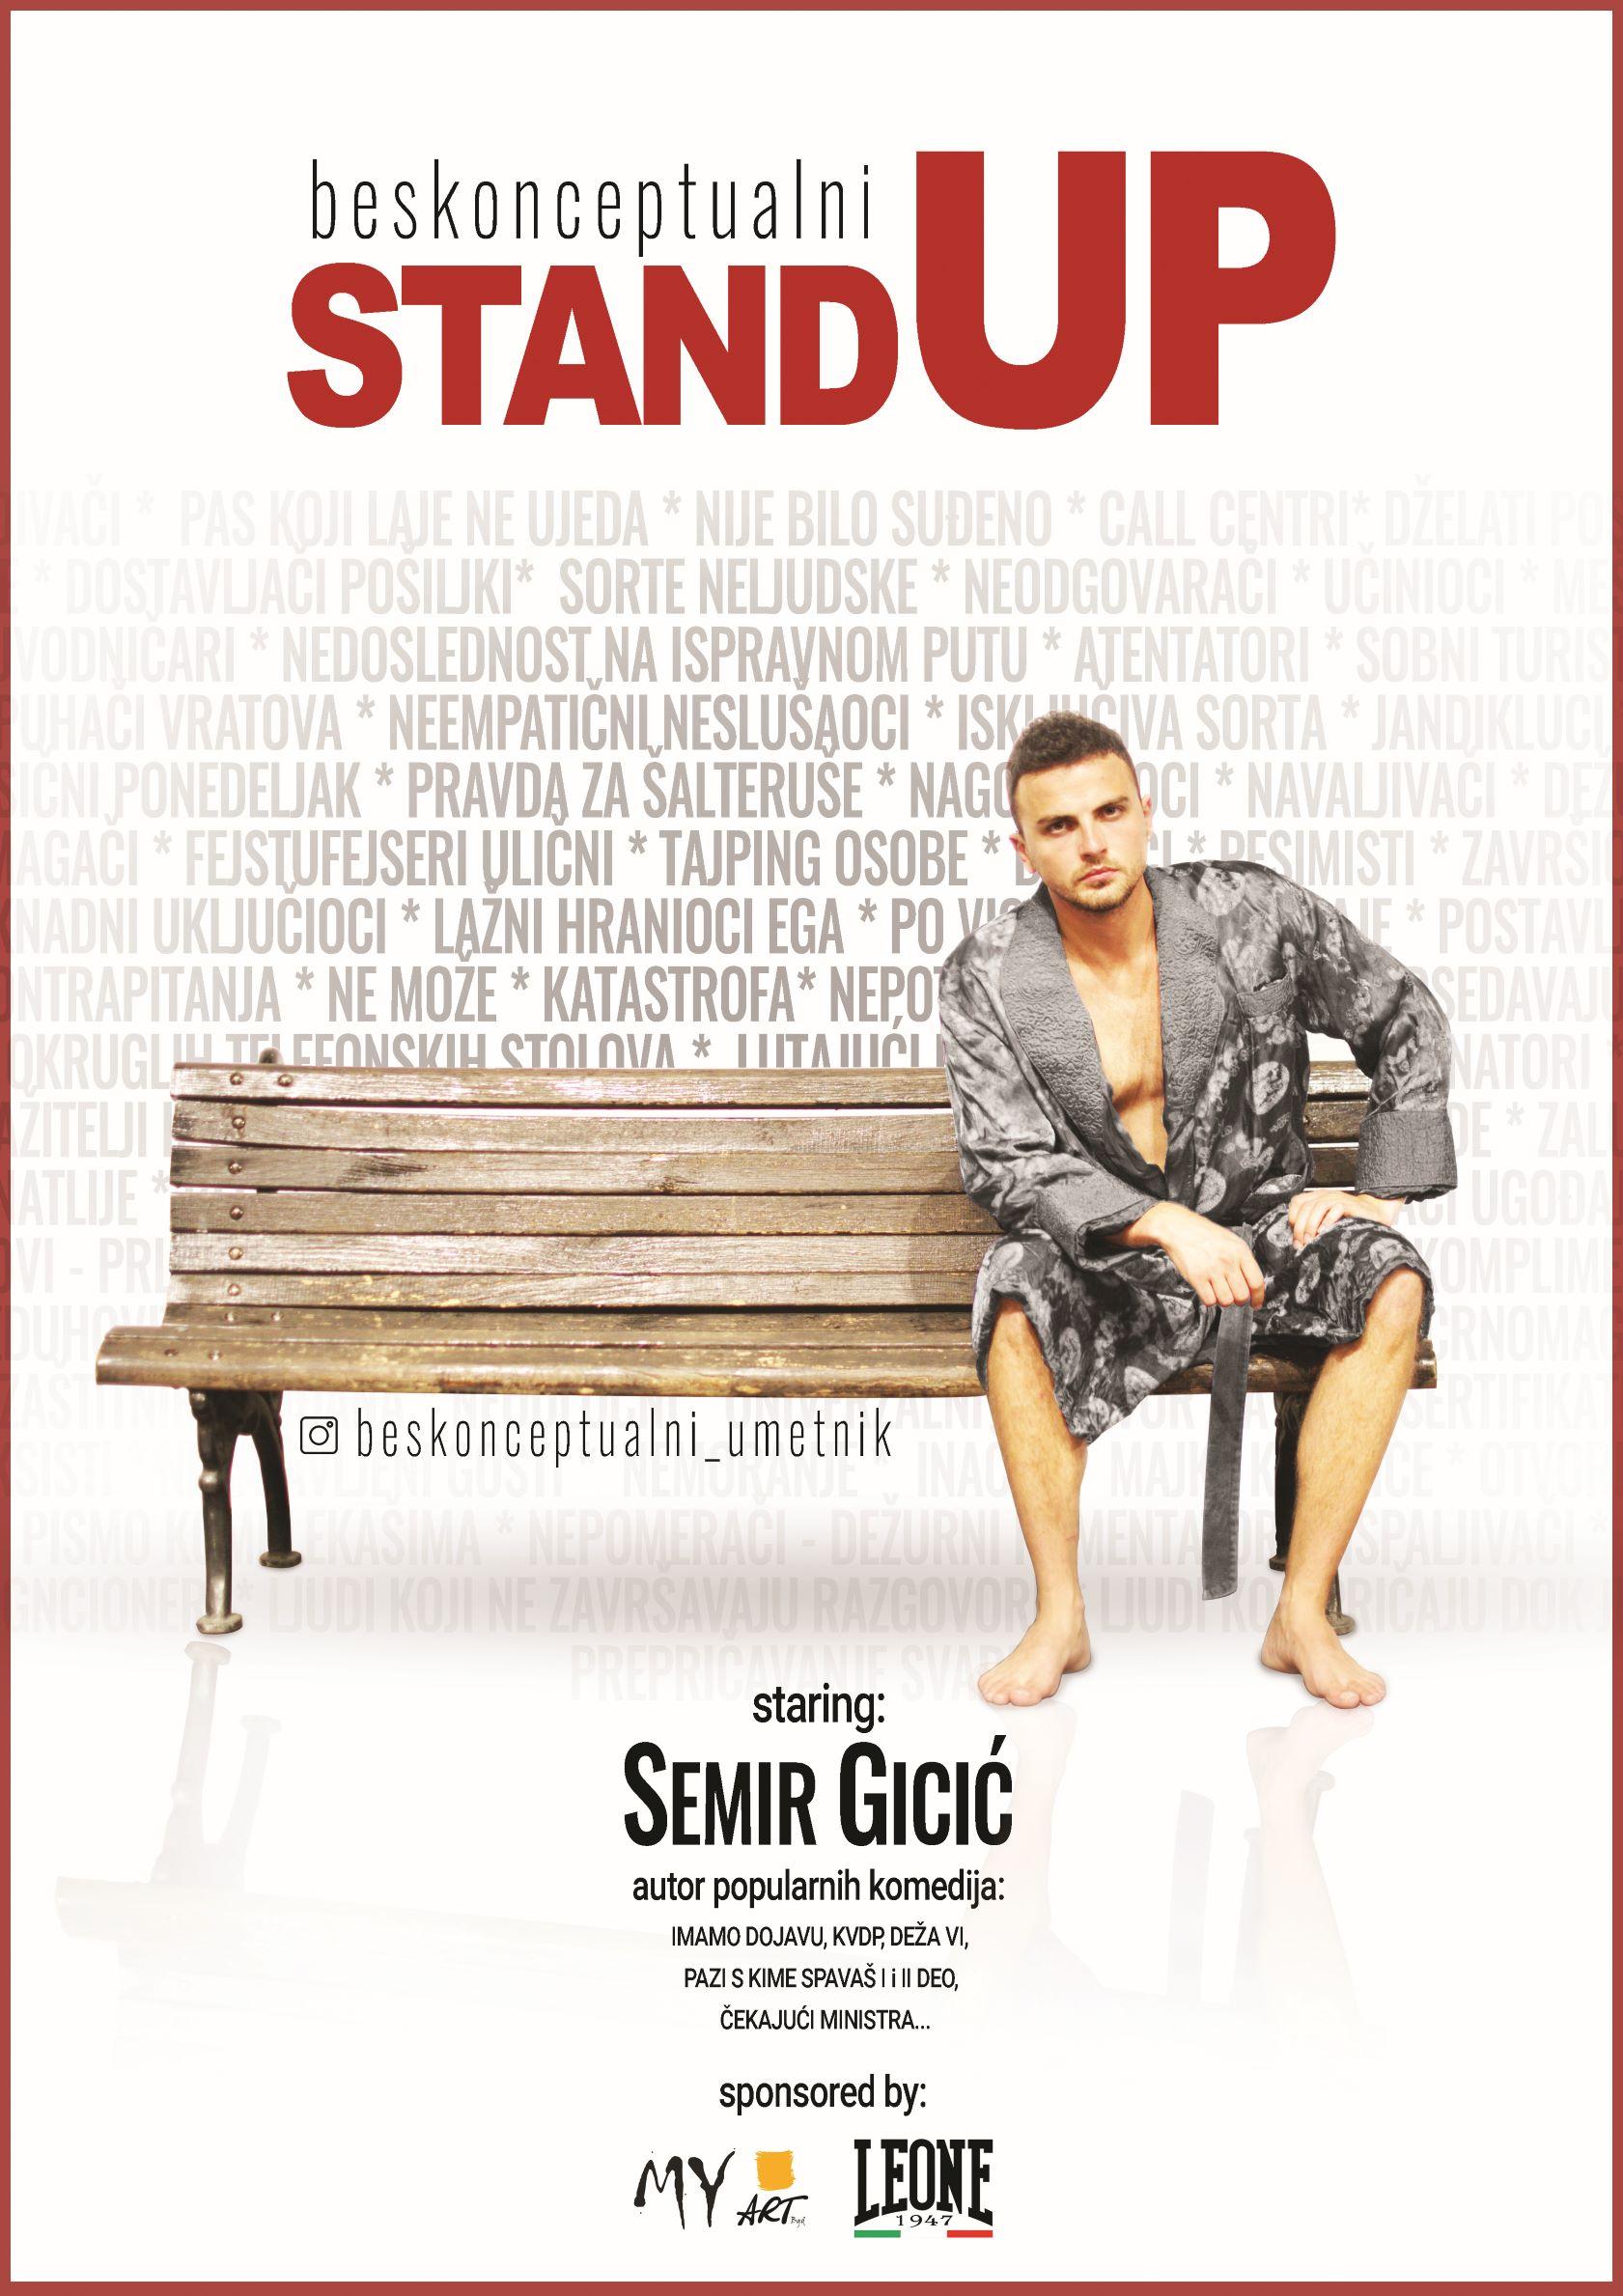 Beskonceptualni stand up Semir Gicic